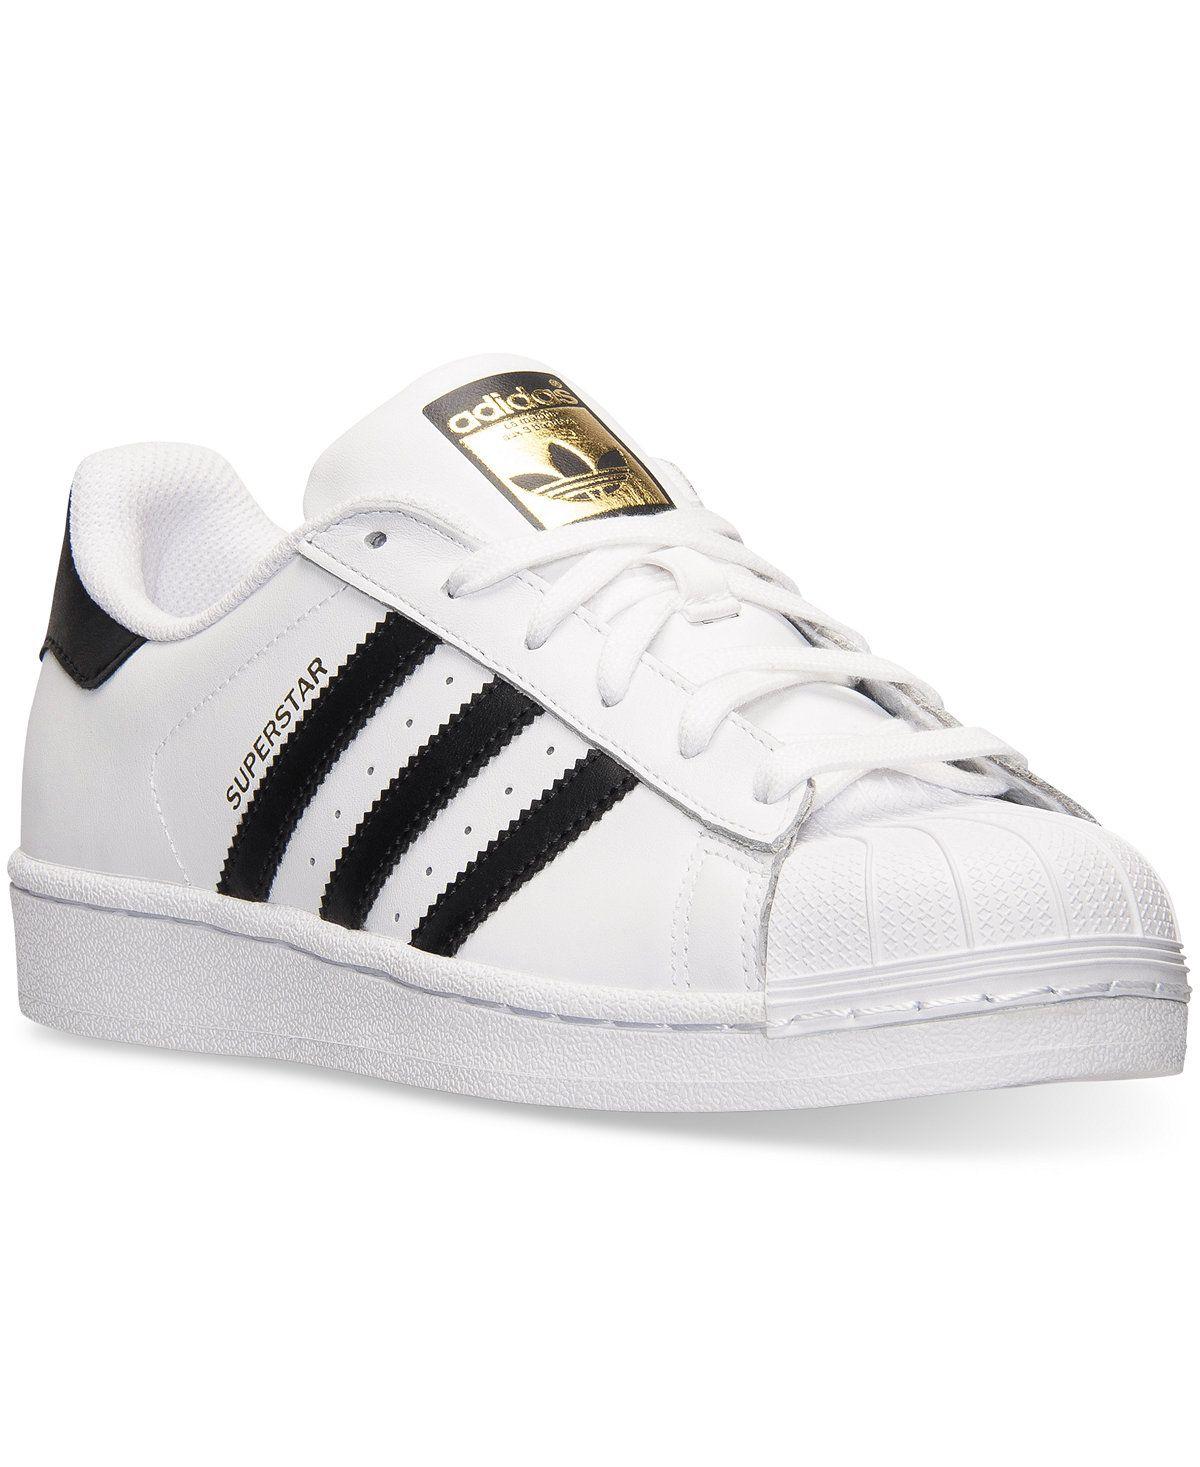 Popular atravesar Fácil de suceder  adidas Women's Superstar Casual Sneakers from Finish Line - Finish Line  Athletic Sneakers - Shoes - Ma… | White athletic shoes, Adidas women, Adidas  superstar black